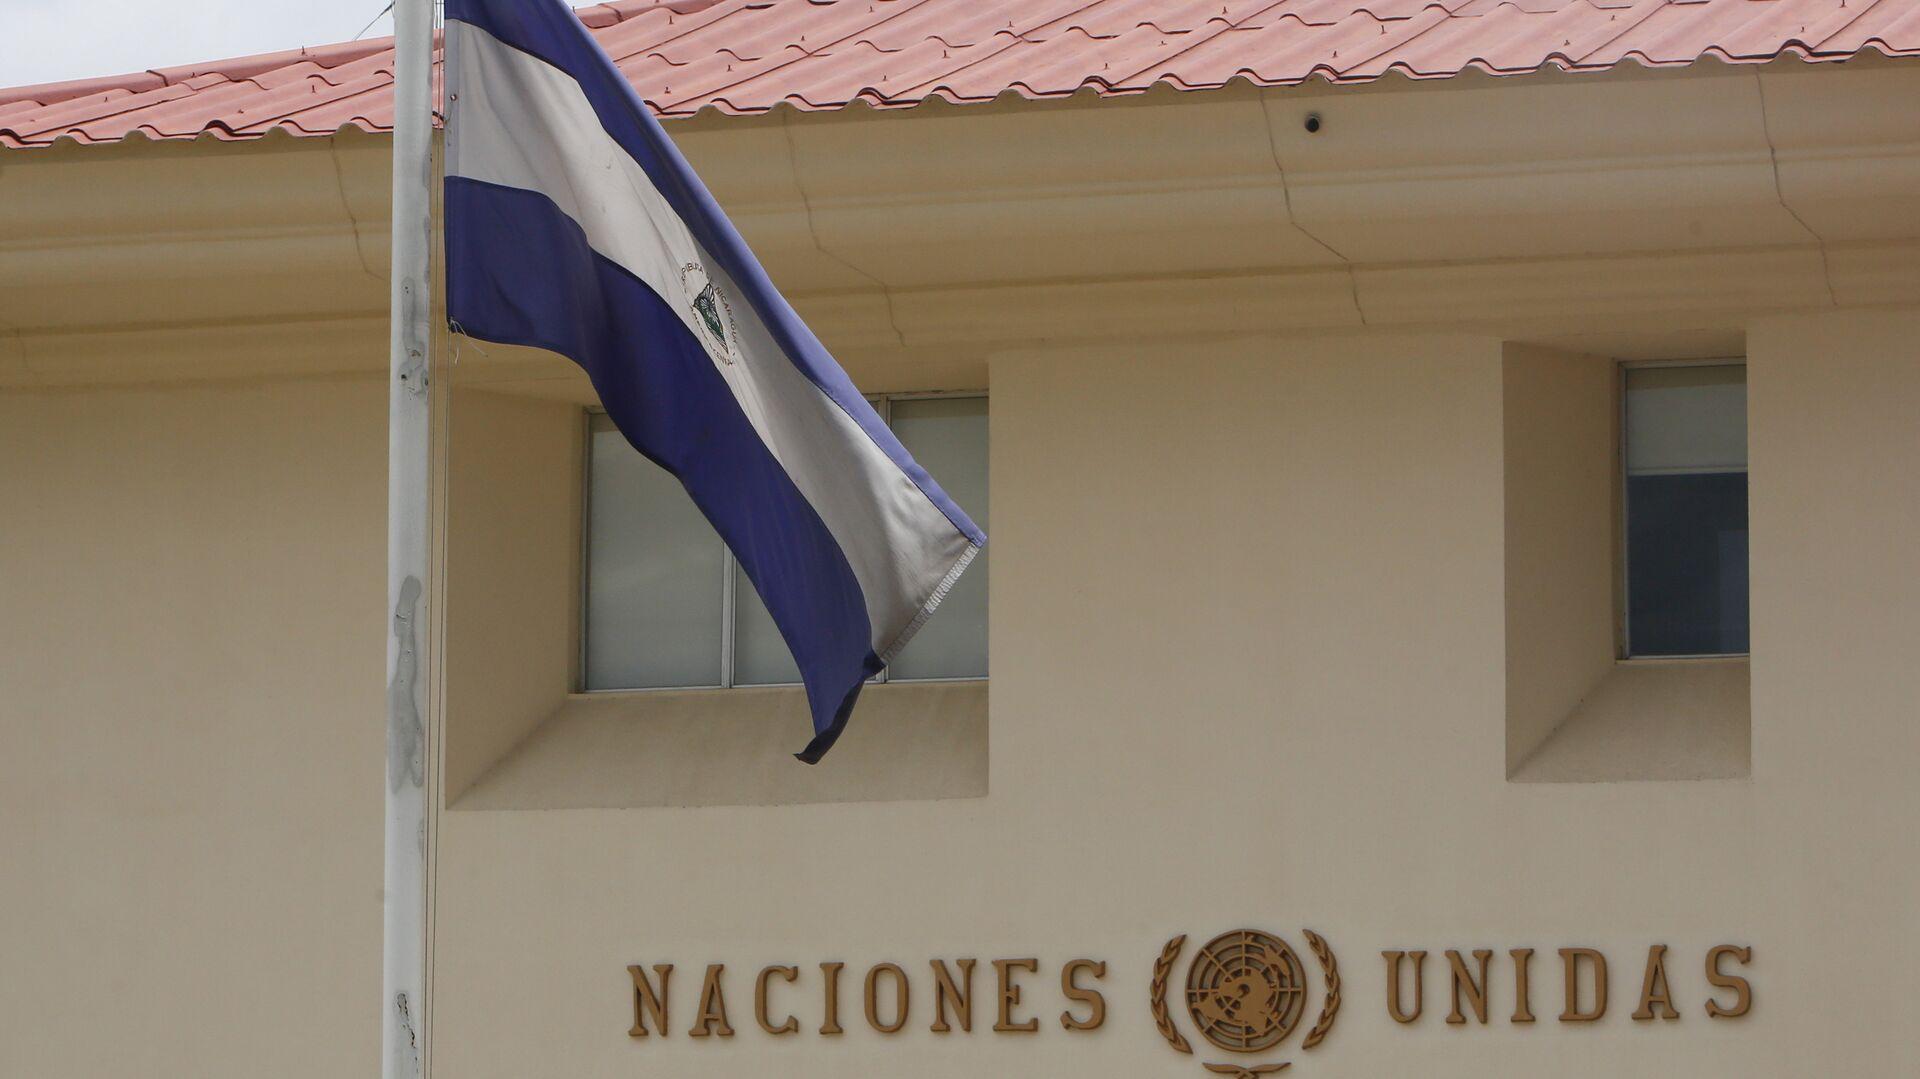 Bandera de Nicaragua - Sputnik Mundo, 1920, 21.09.2021